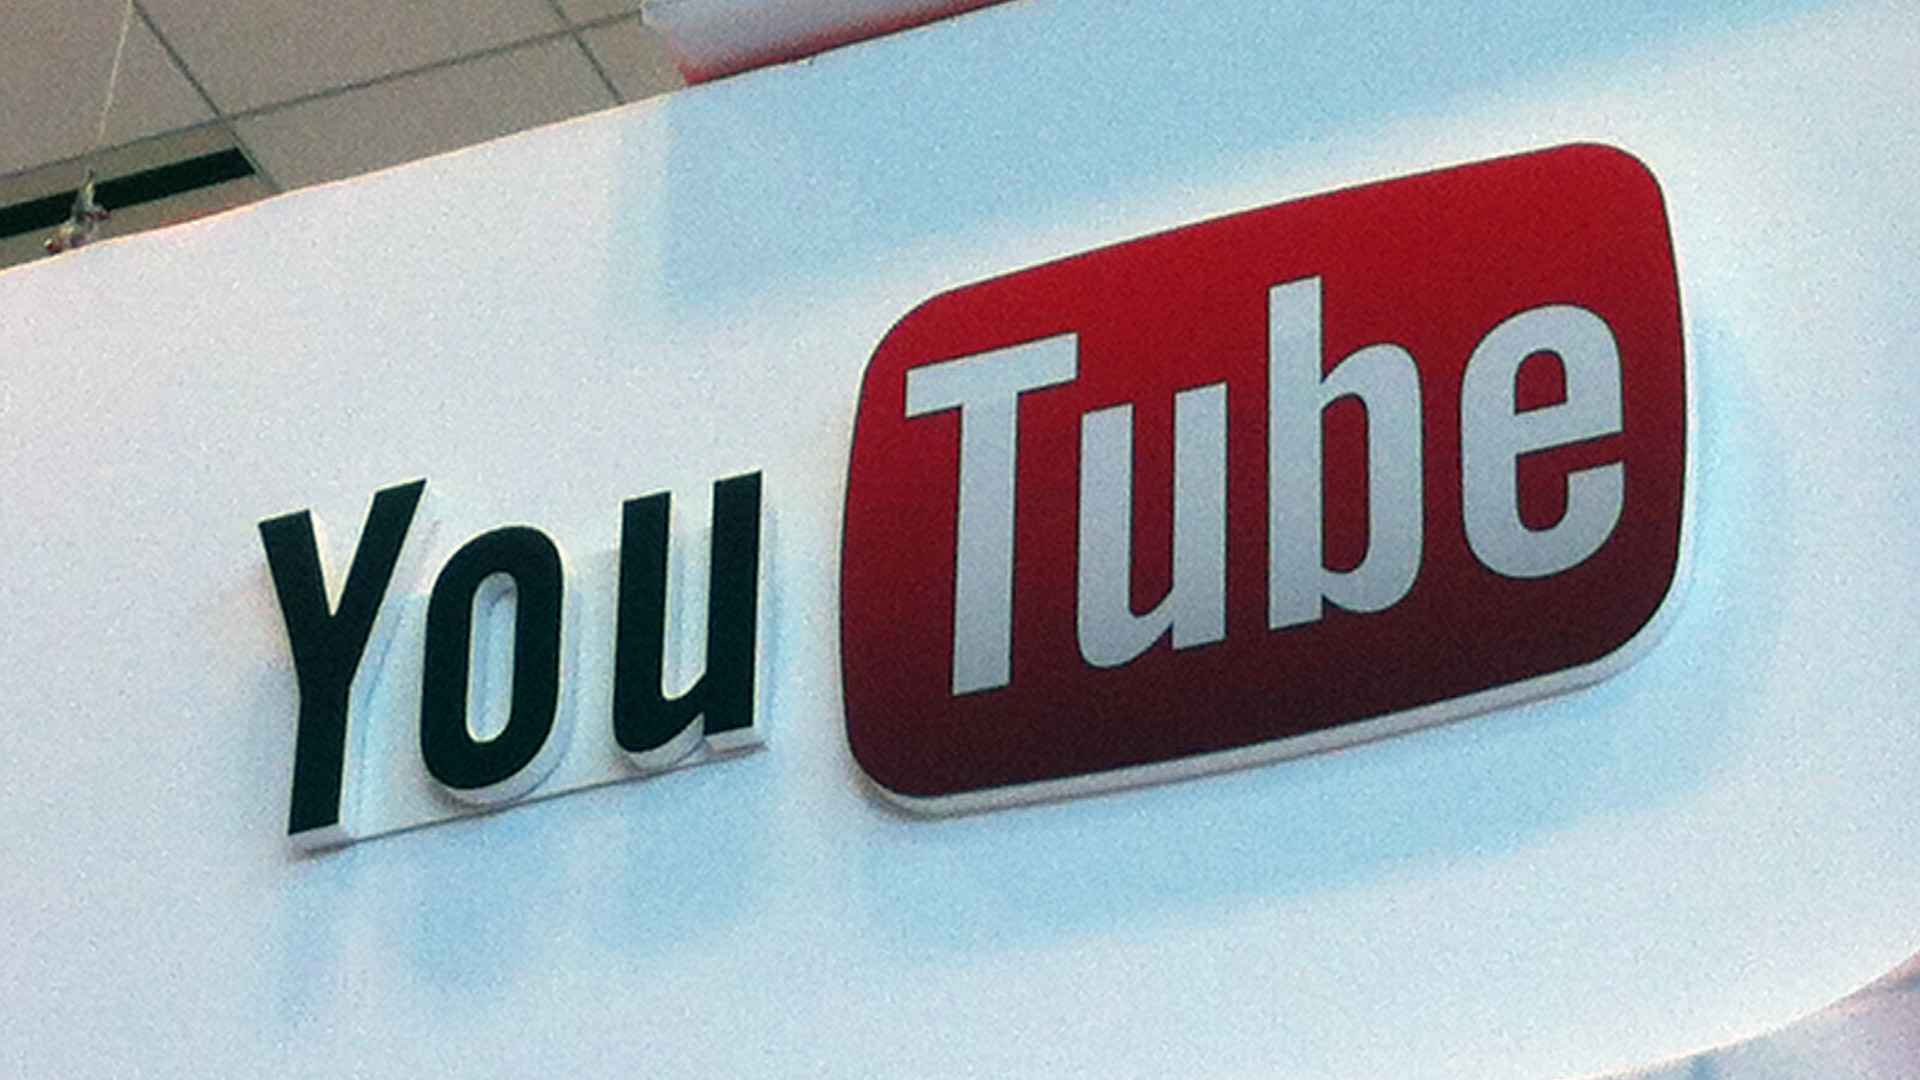 youtube-logo-1920